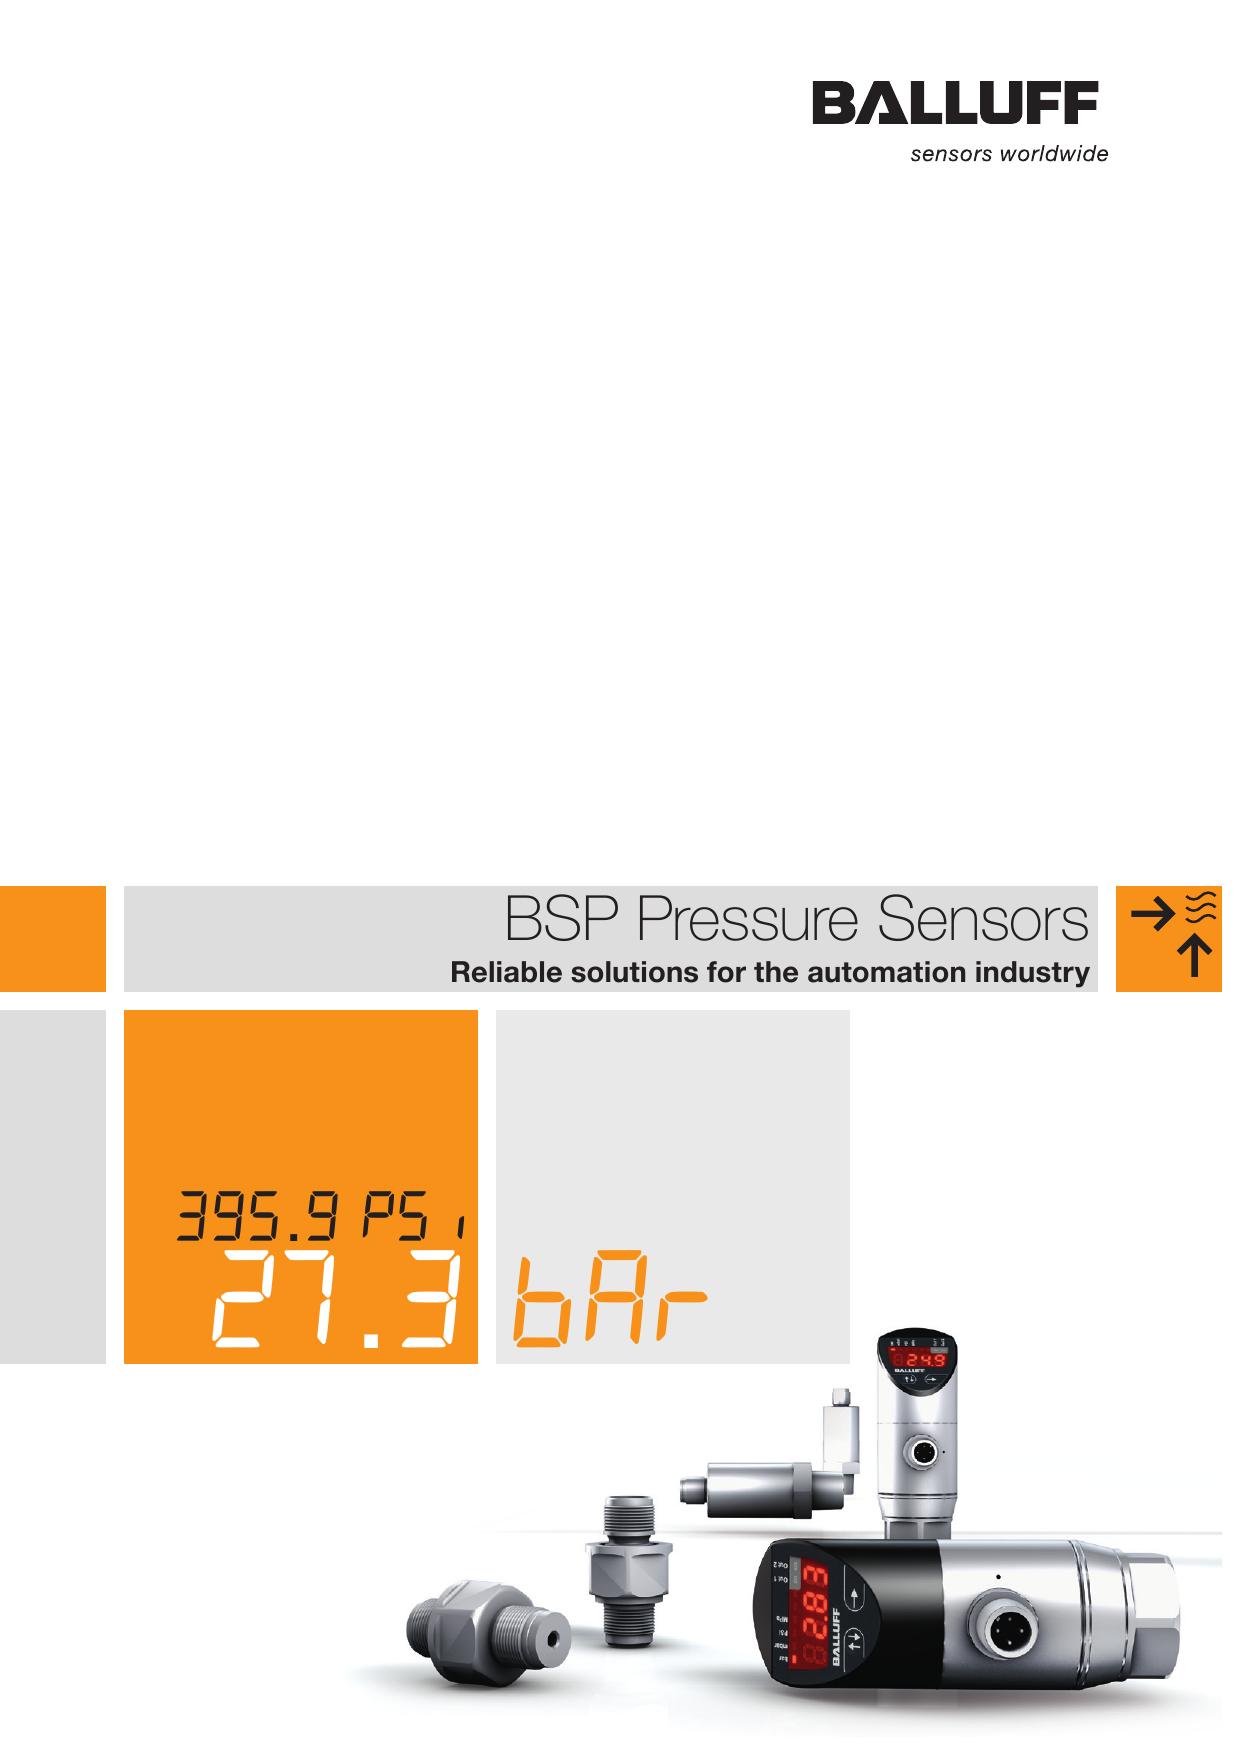 Bsp Pressure Sensors Balluff Wiring Diagram Aperza Catalog